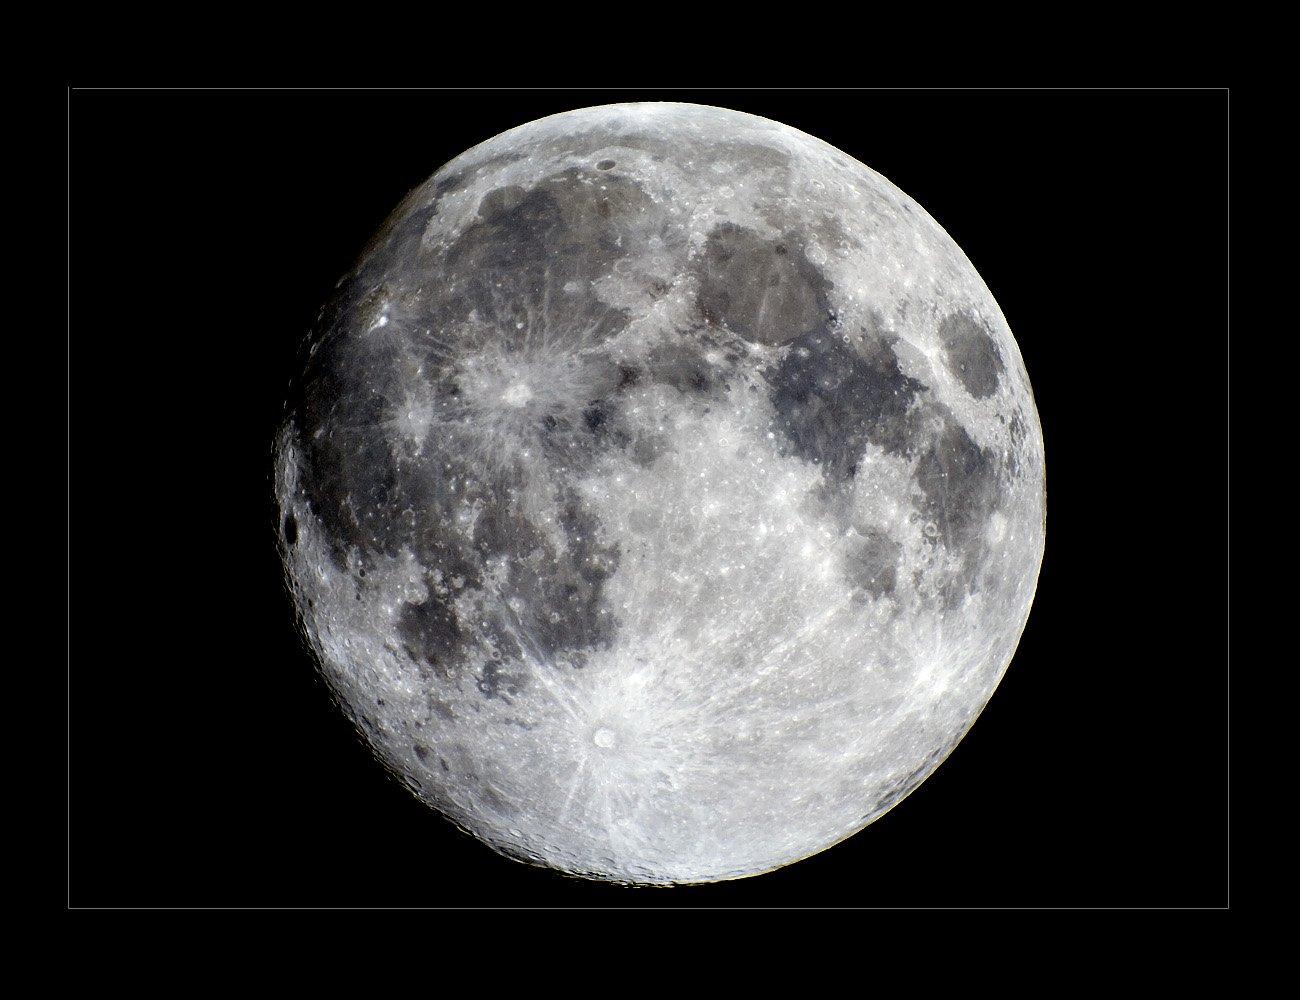 moon observation nasa - photo #44